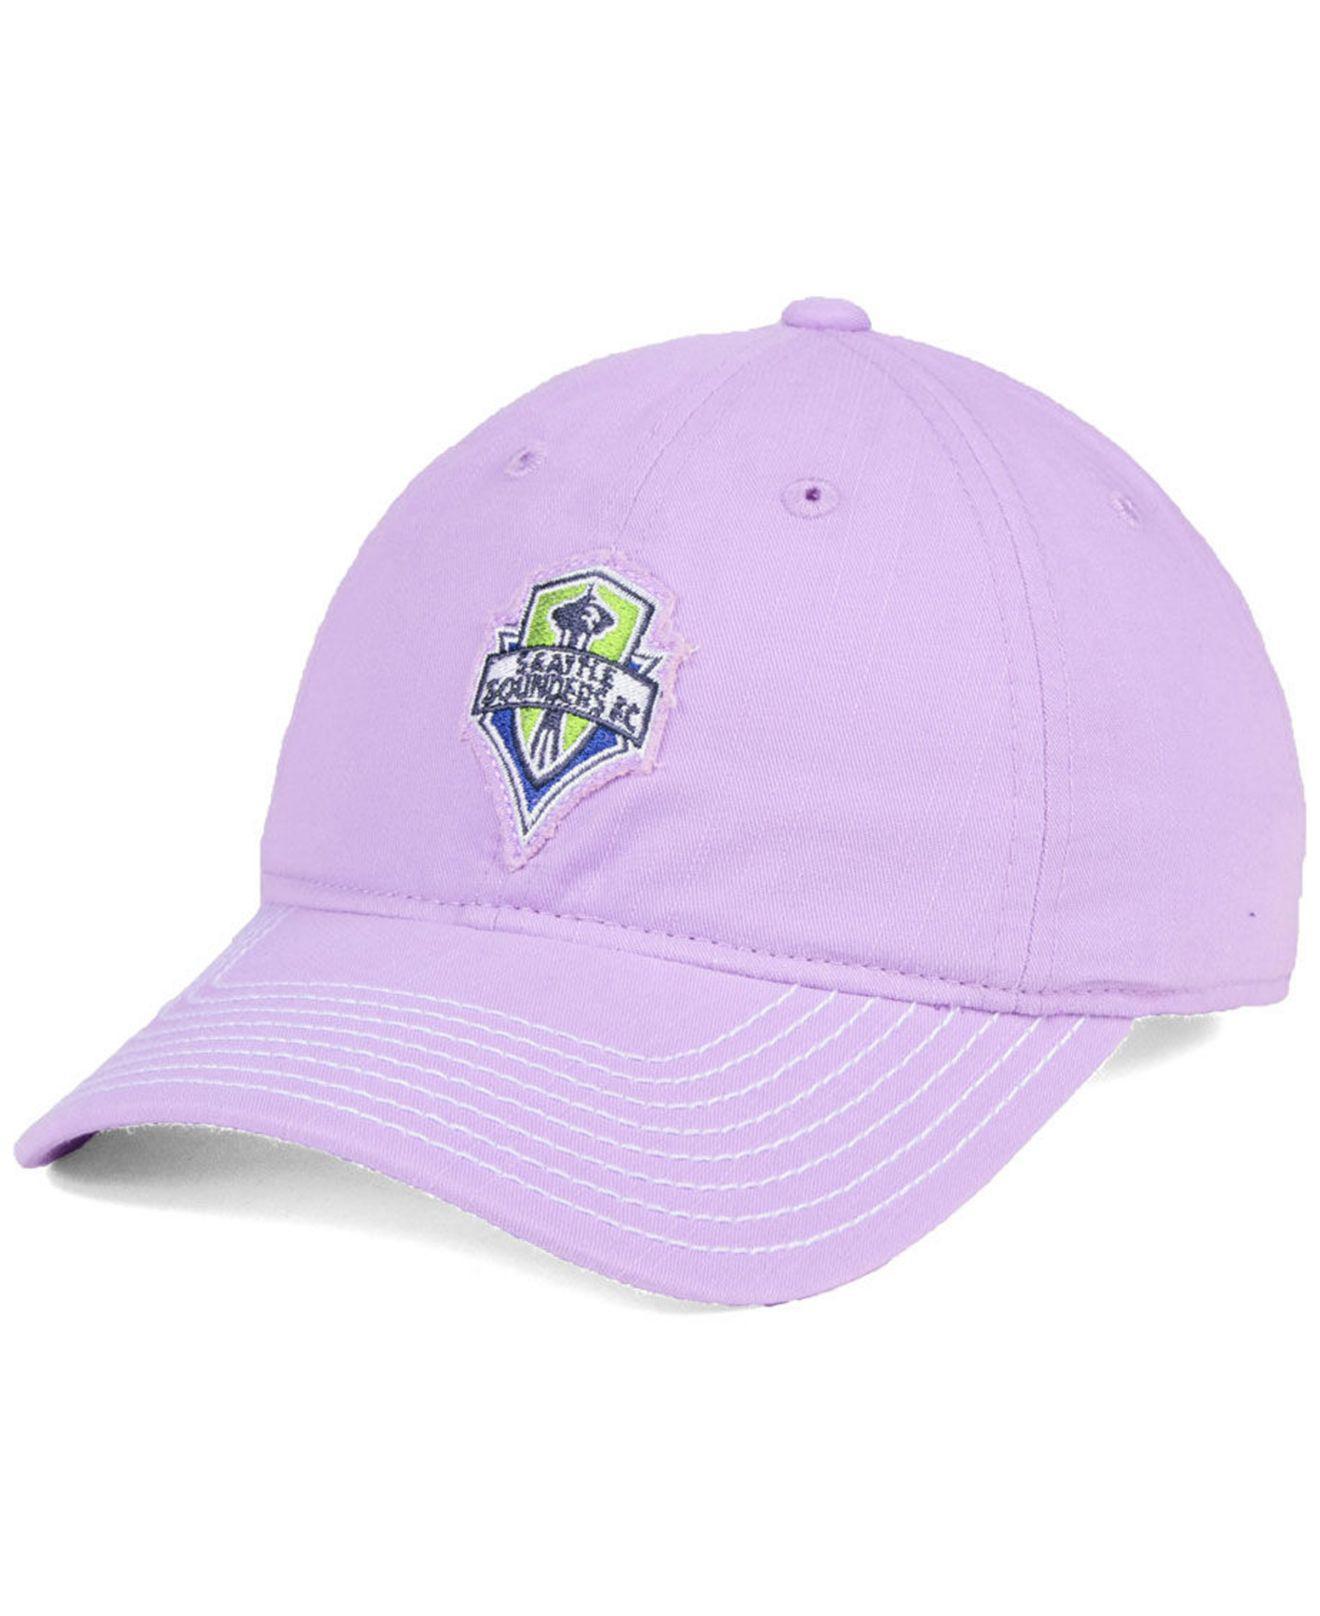 timeless design bd9a0 5d013 ... canada adidas. womens purple seattle sounders fc pink slouch cap 4e56e  de5fa